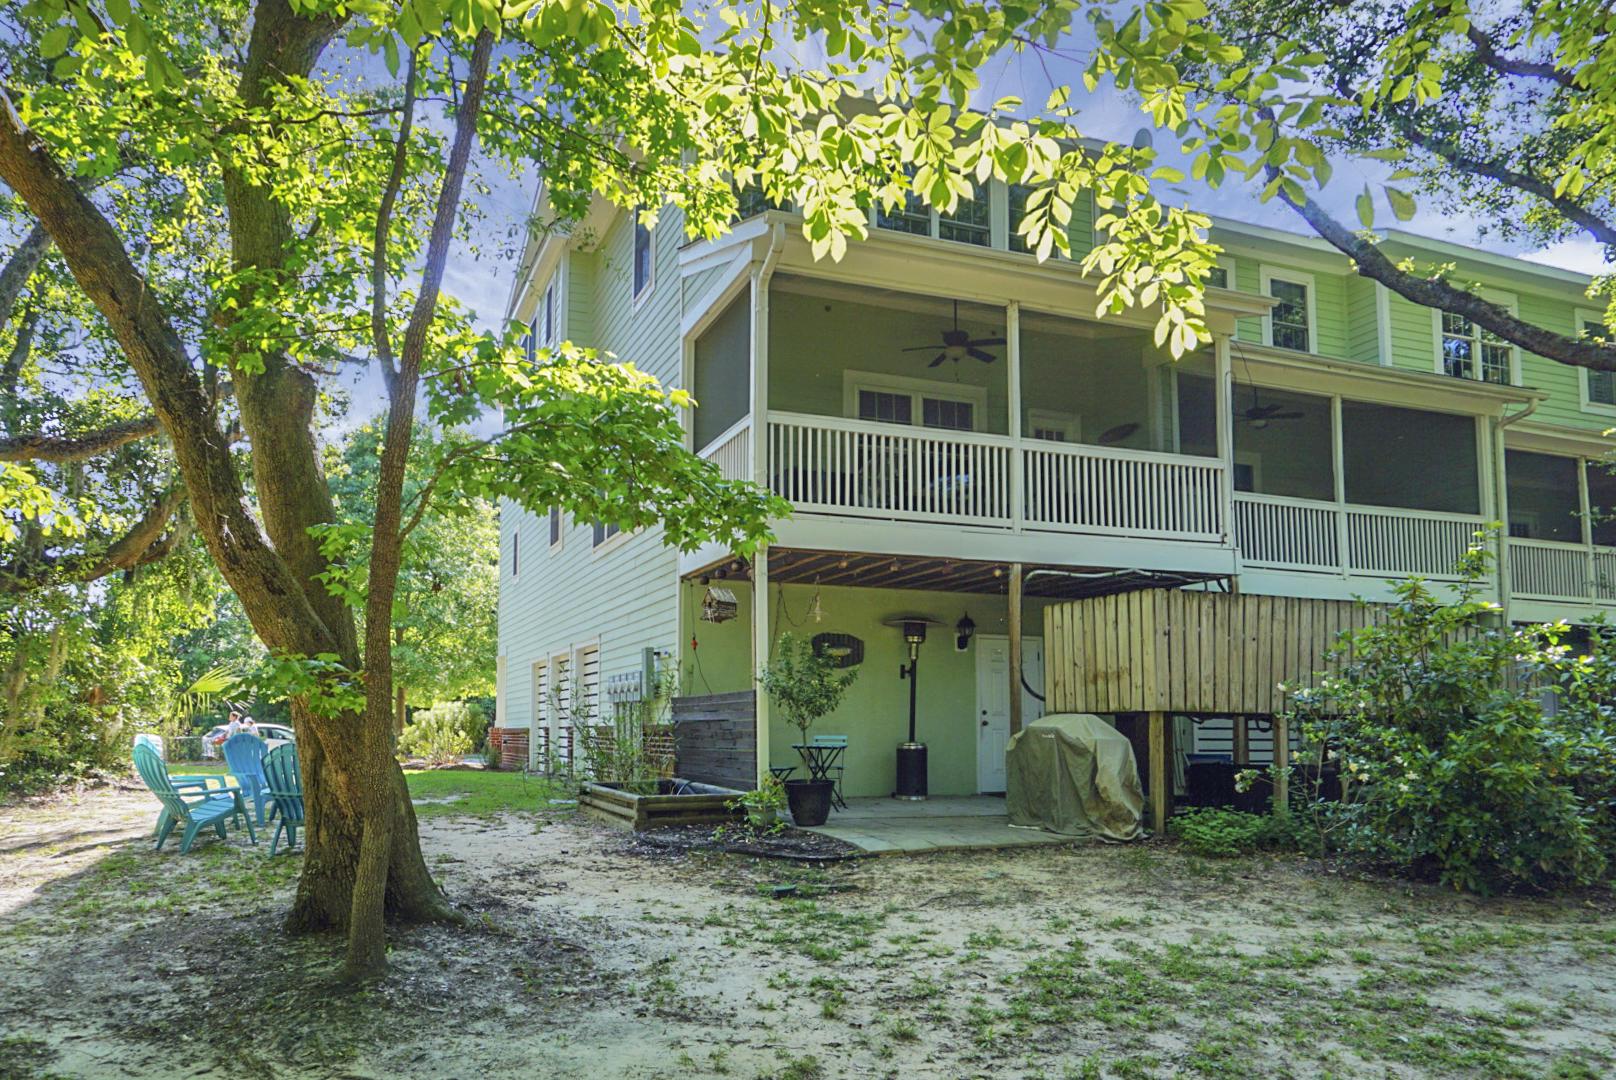 Etiwan Pointe Homes For Sale - 269 Etiwan Pointe, Mount Pleasant, SC - 11